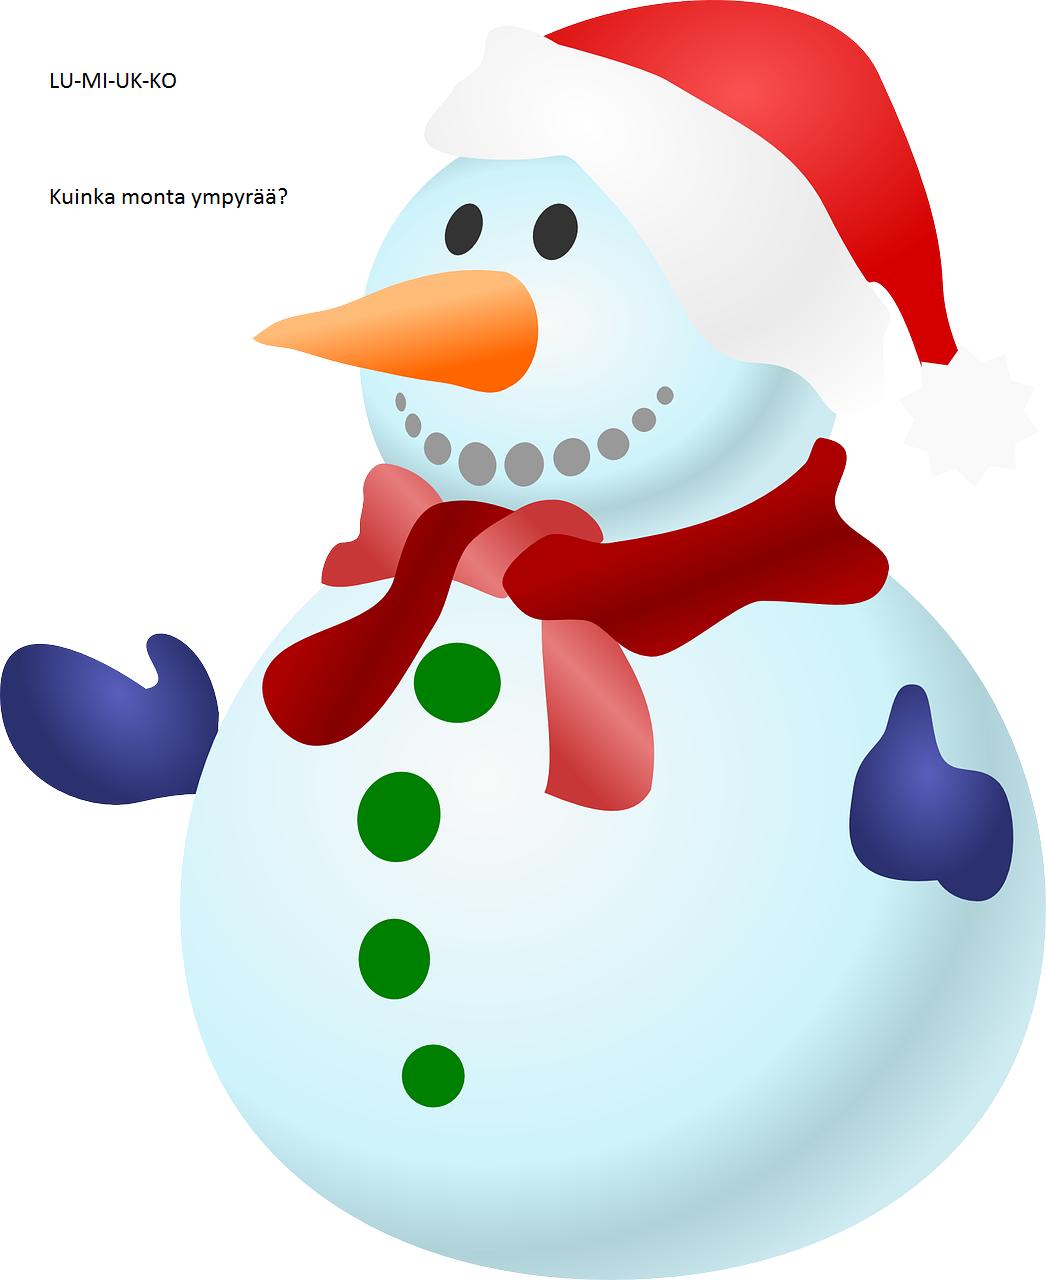 joulukalenteri 2018 molla Joulukalenteri 2016 MOLLA joulukalenteri 2018 molla